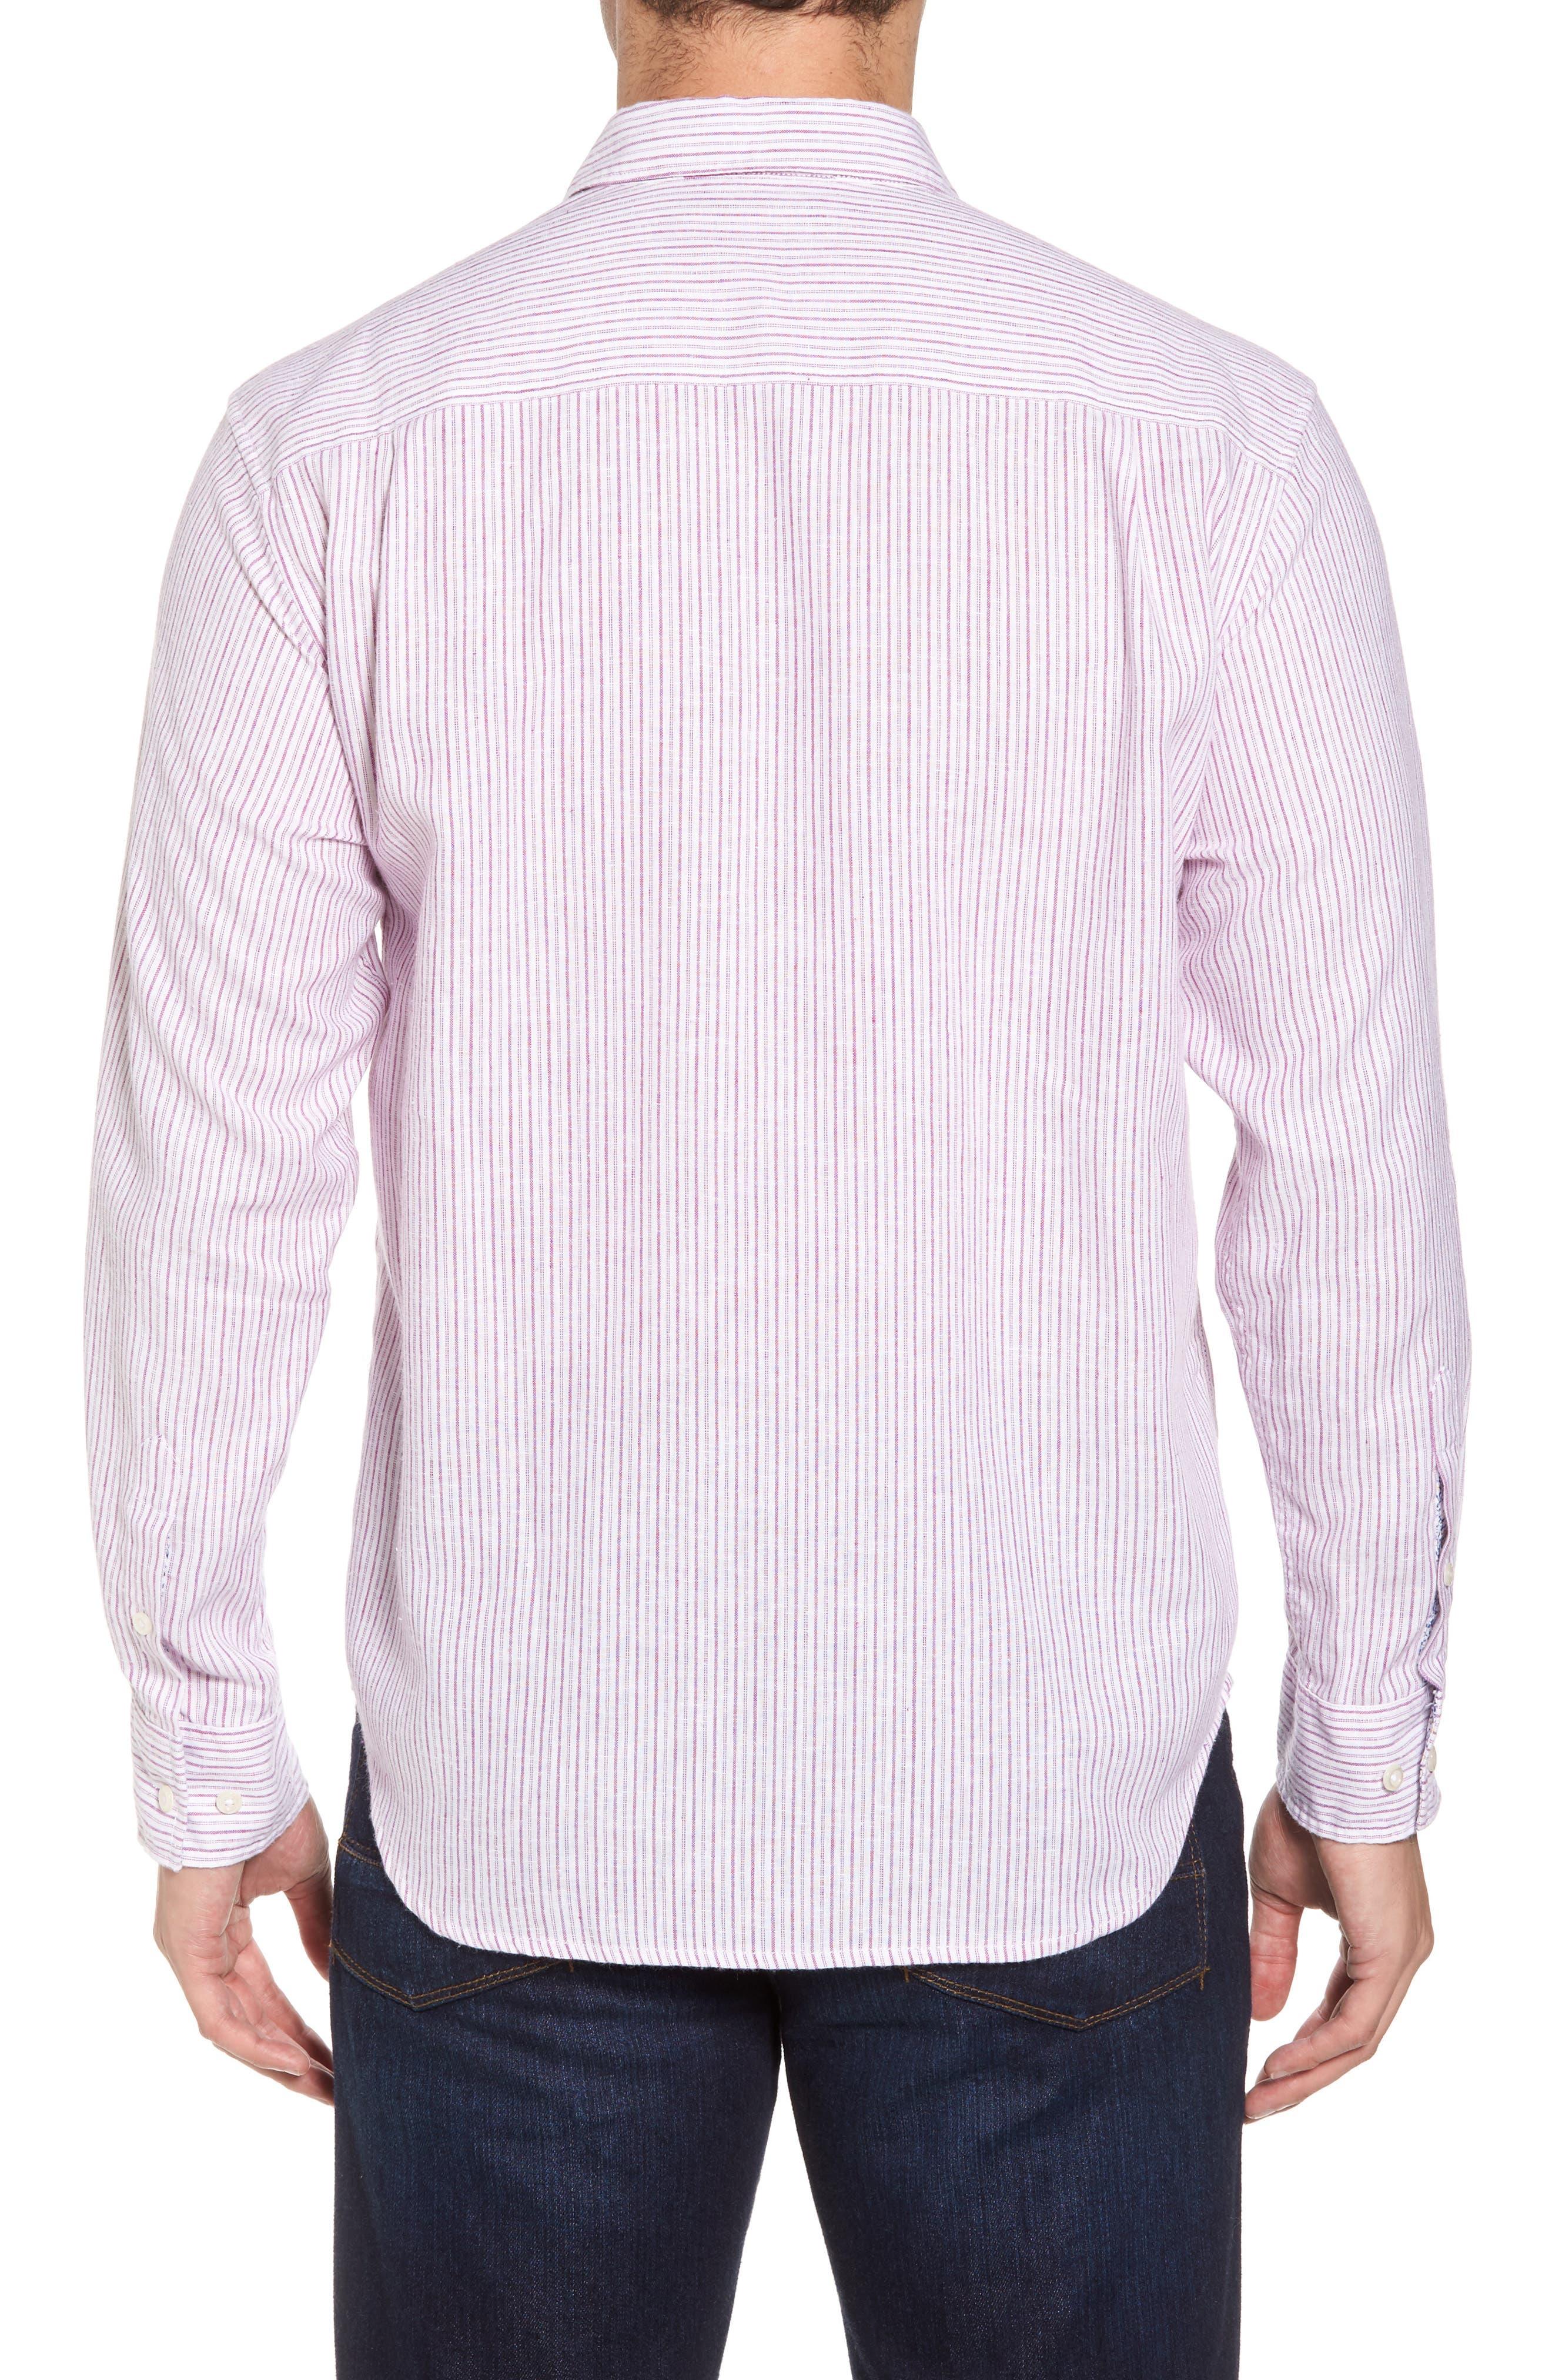 Bungalow Stripe Regular Fit Linen Blend Sport Shirt,                             Alternate thumbnail 2, color,                             Ultra Violet